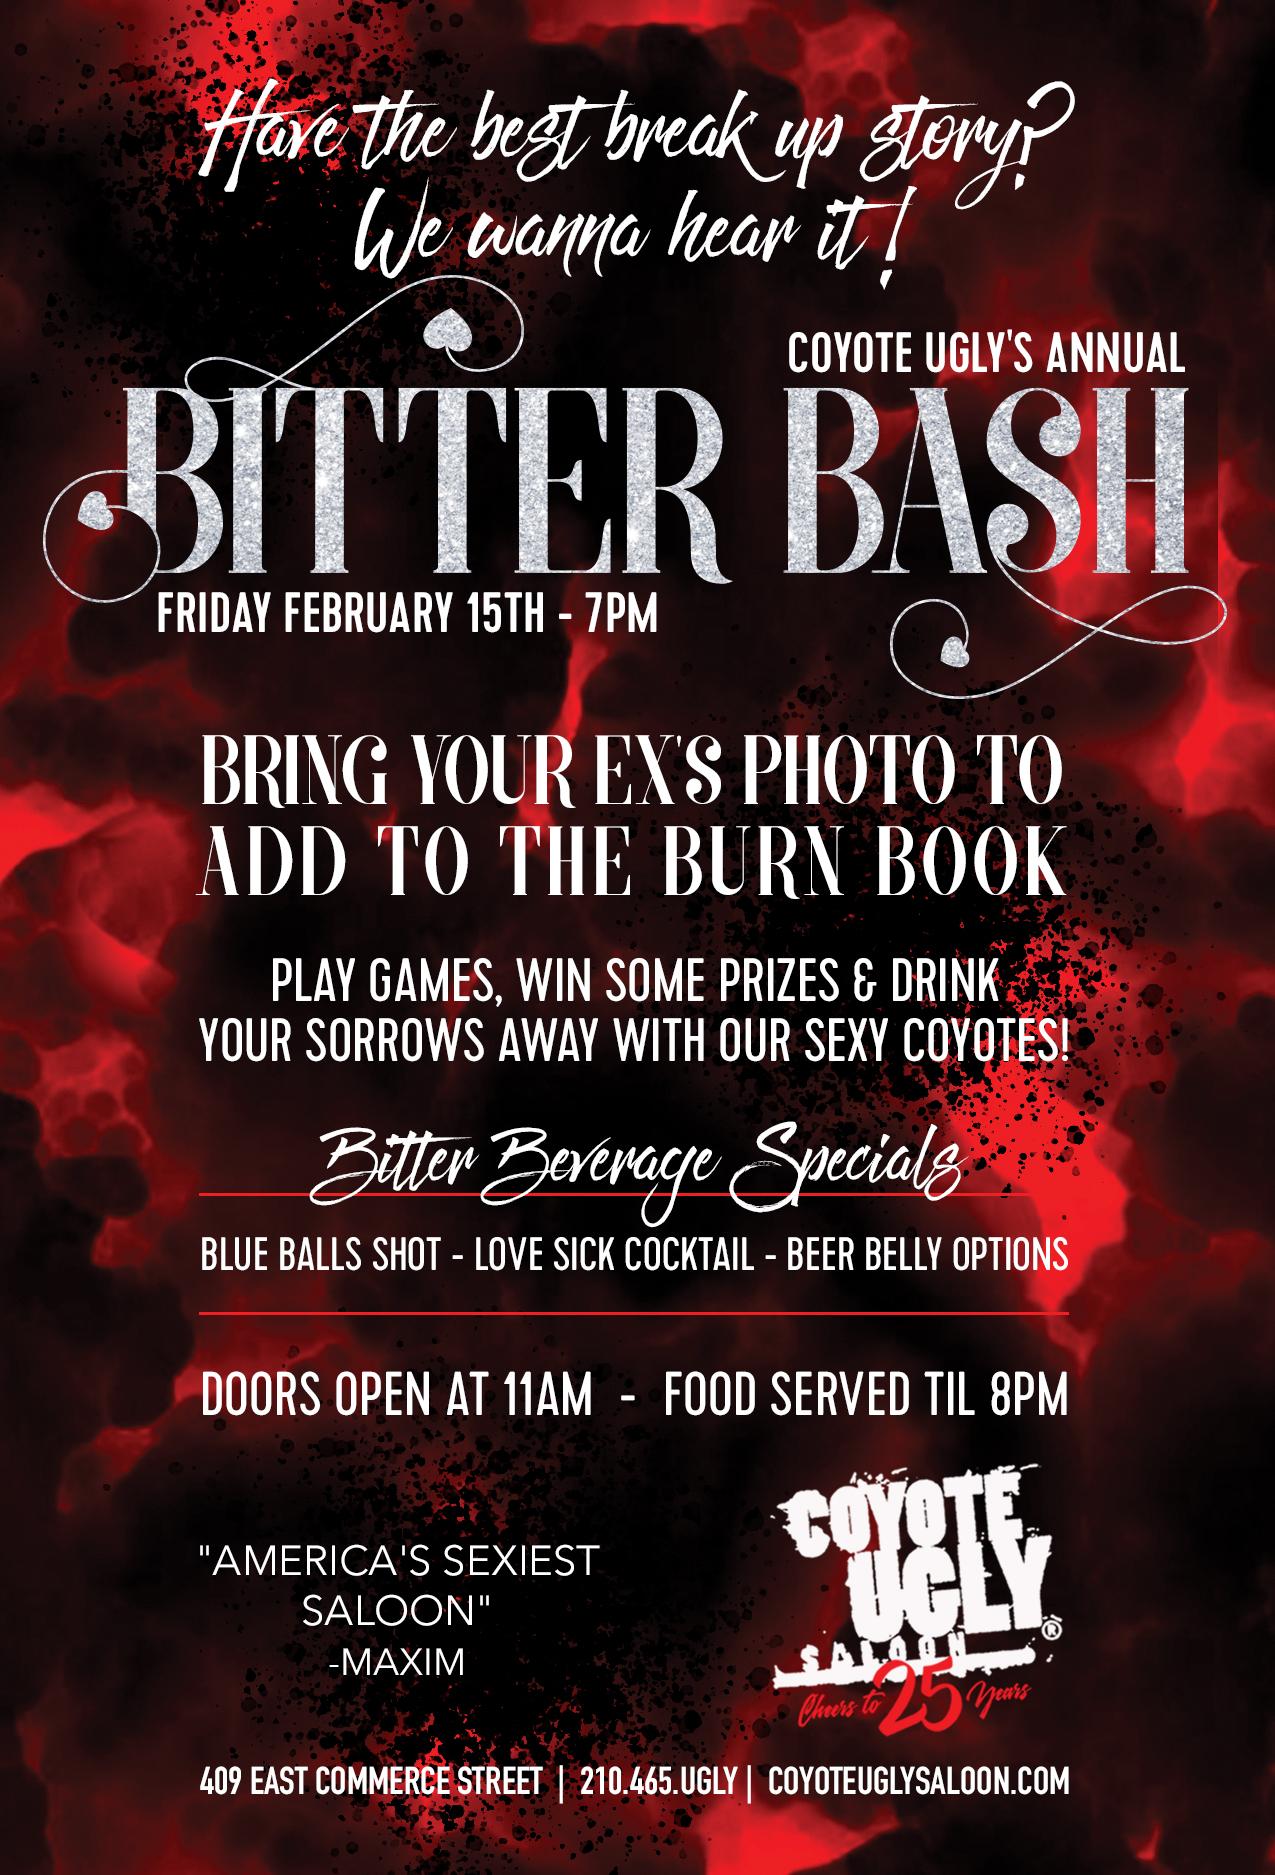 Bitter Bash in San Antonio on February 15, 2019